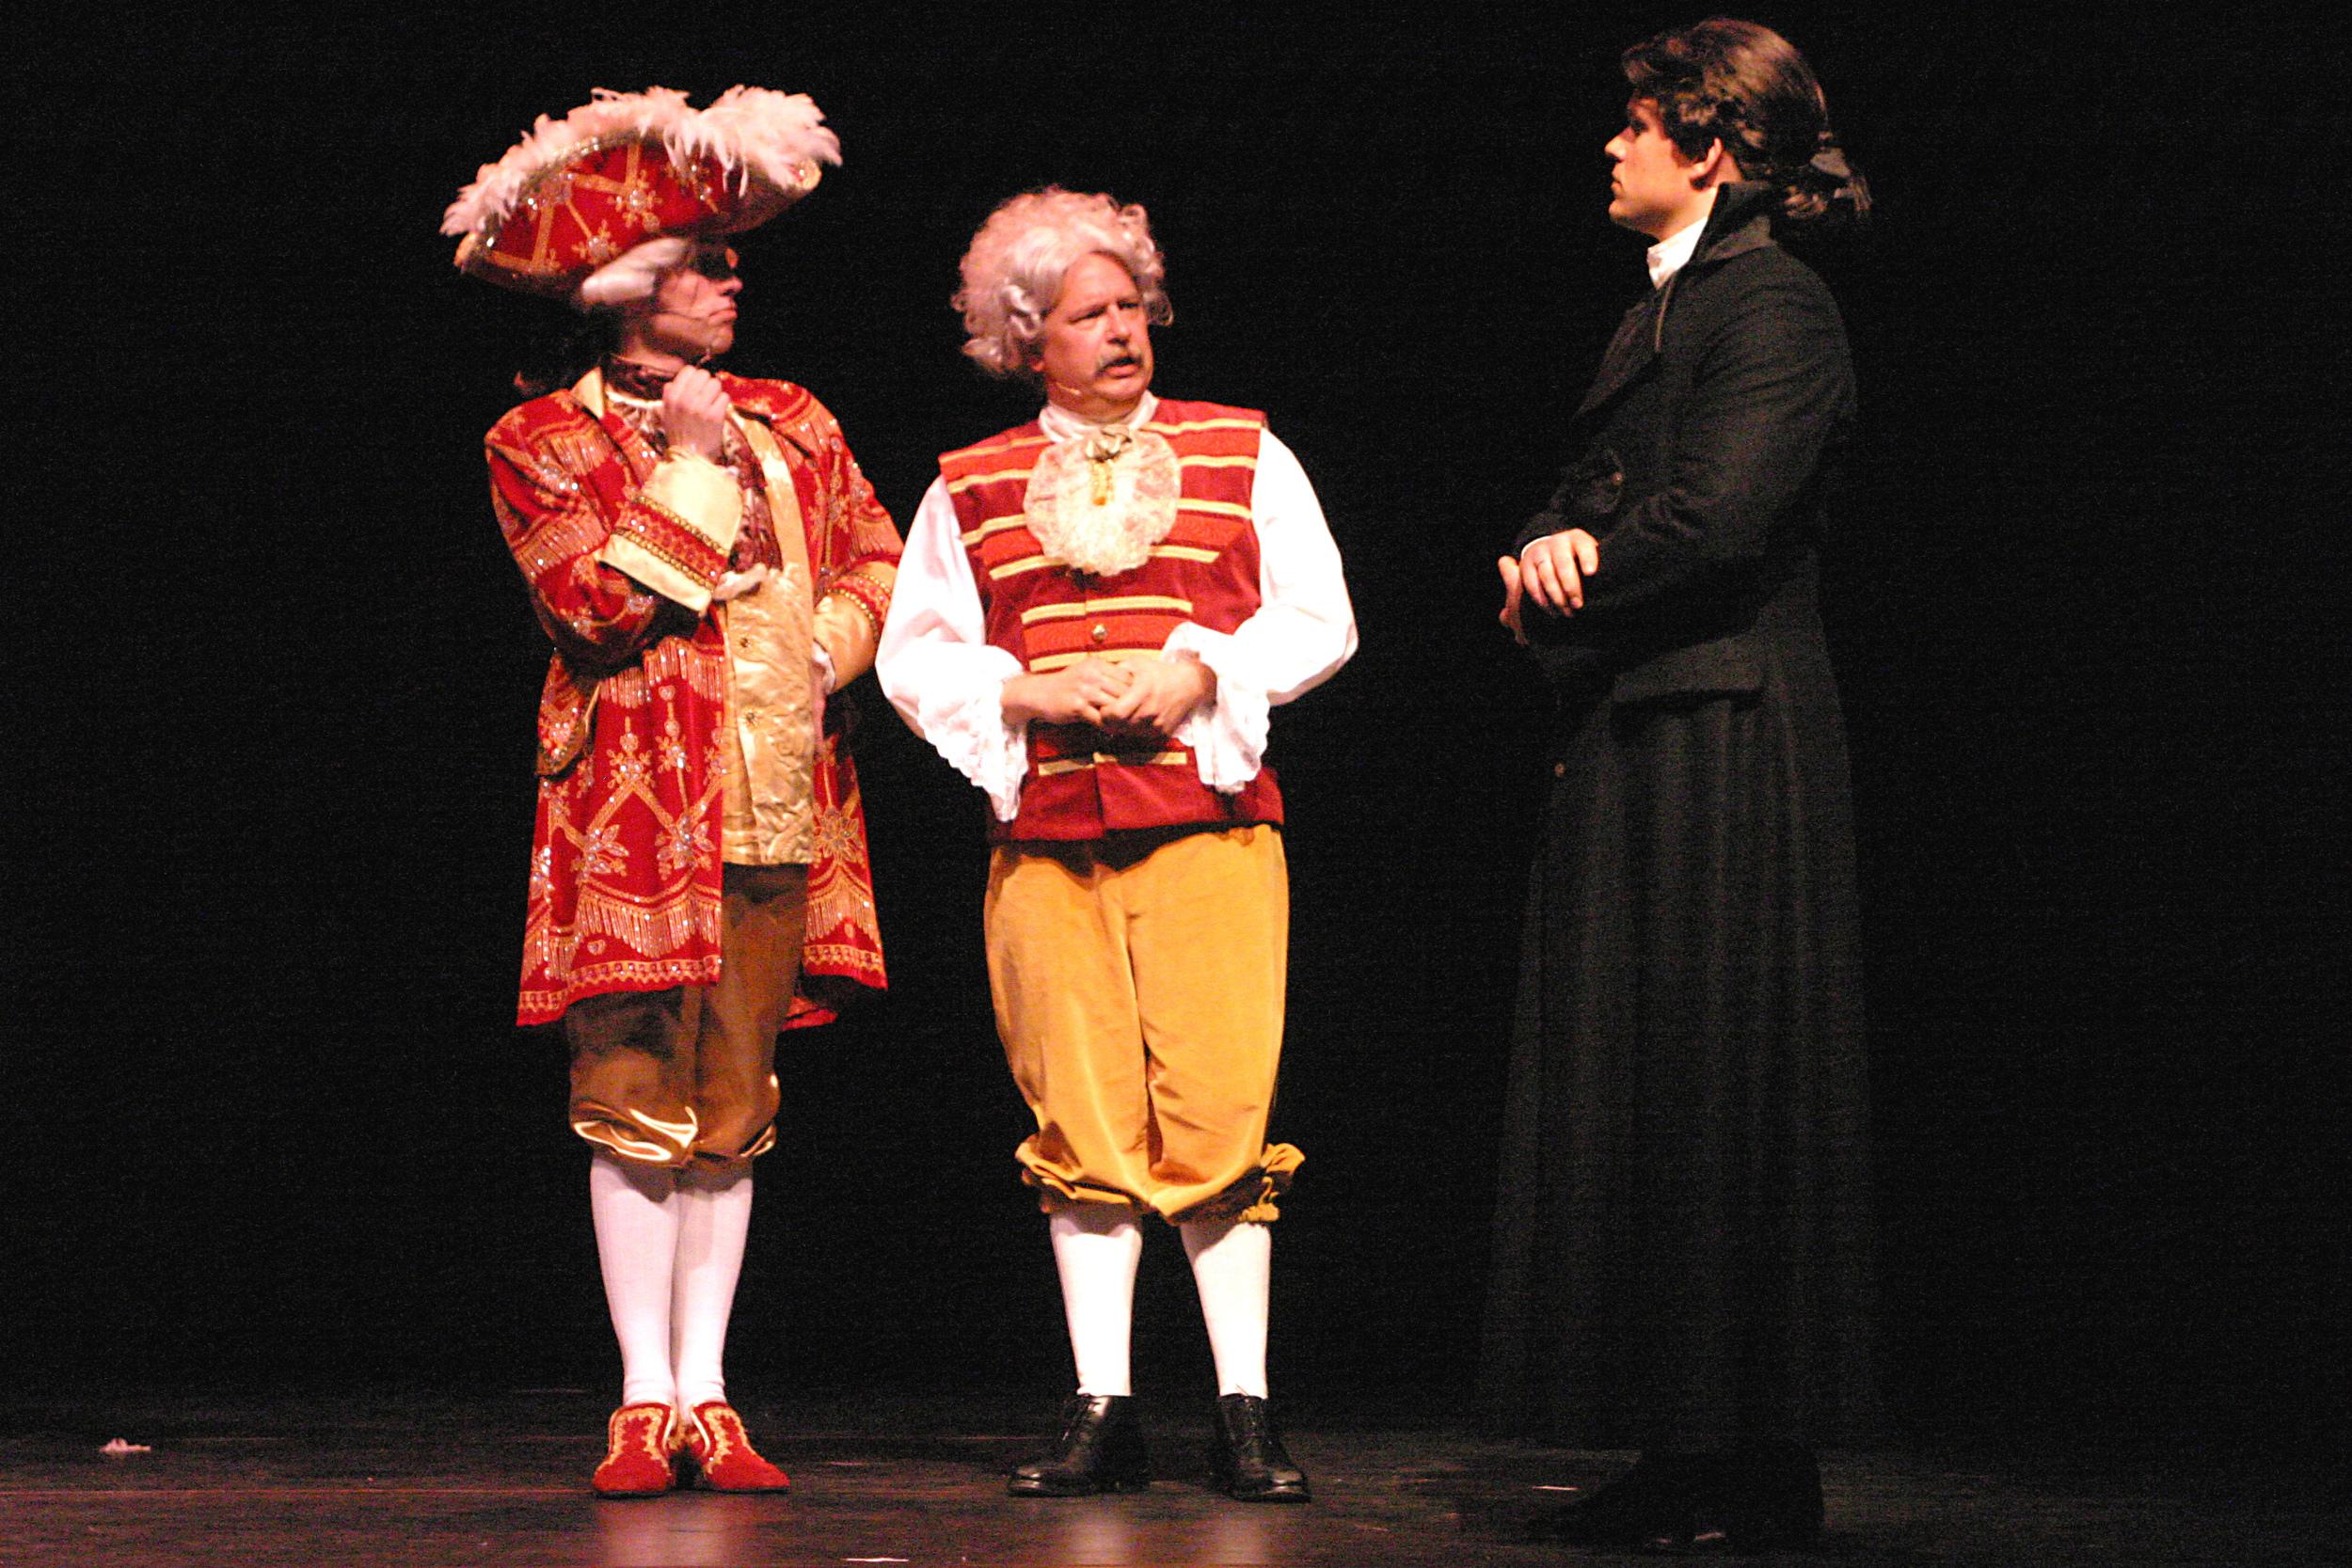 028 - The Scarlet Pimpernel 2005 - Generale.jpg